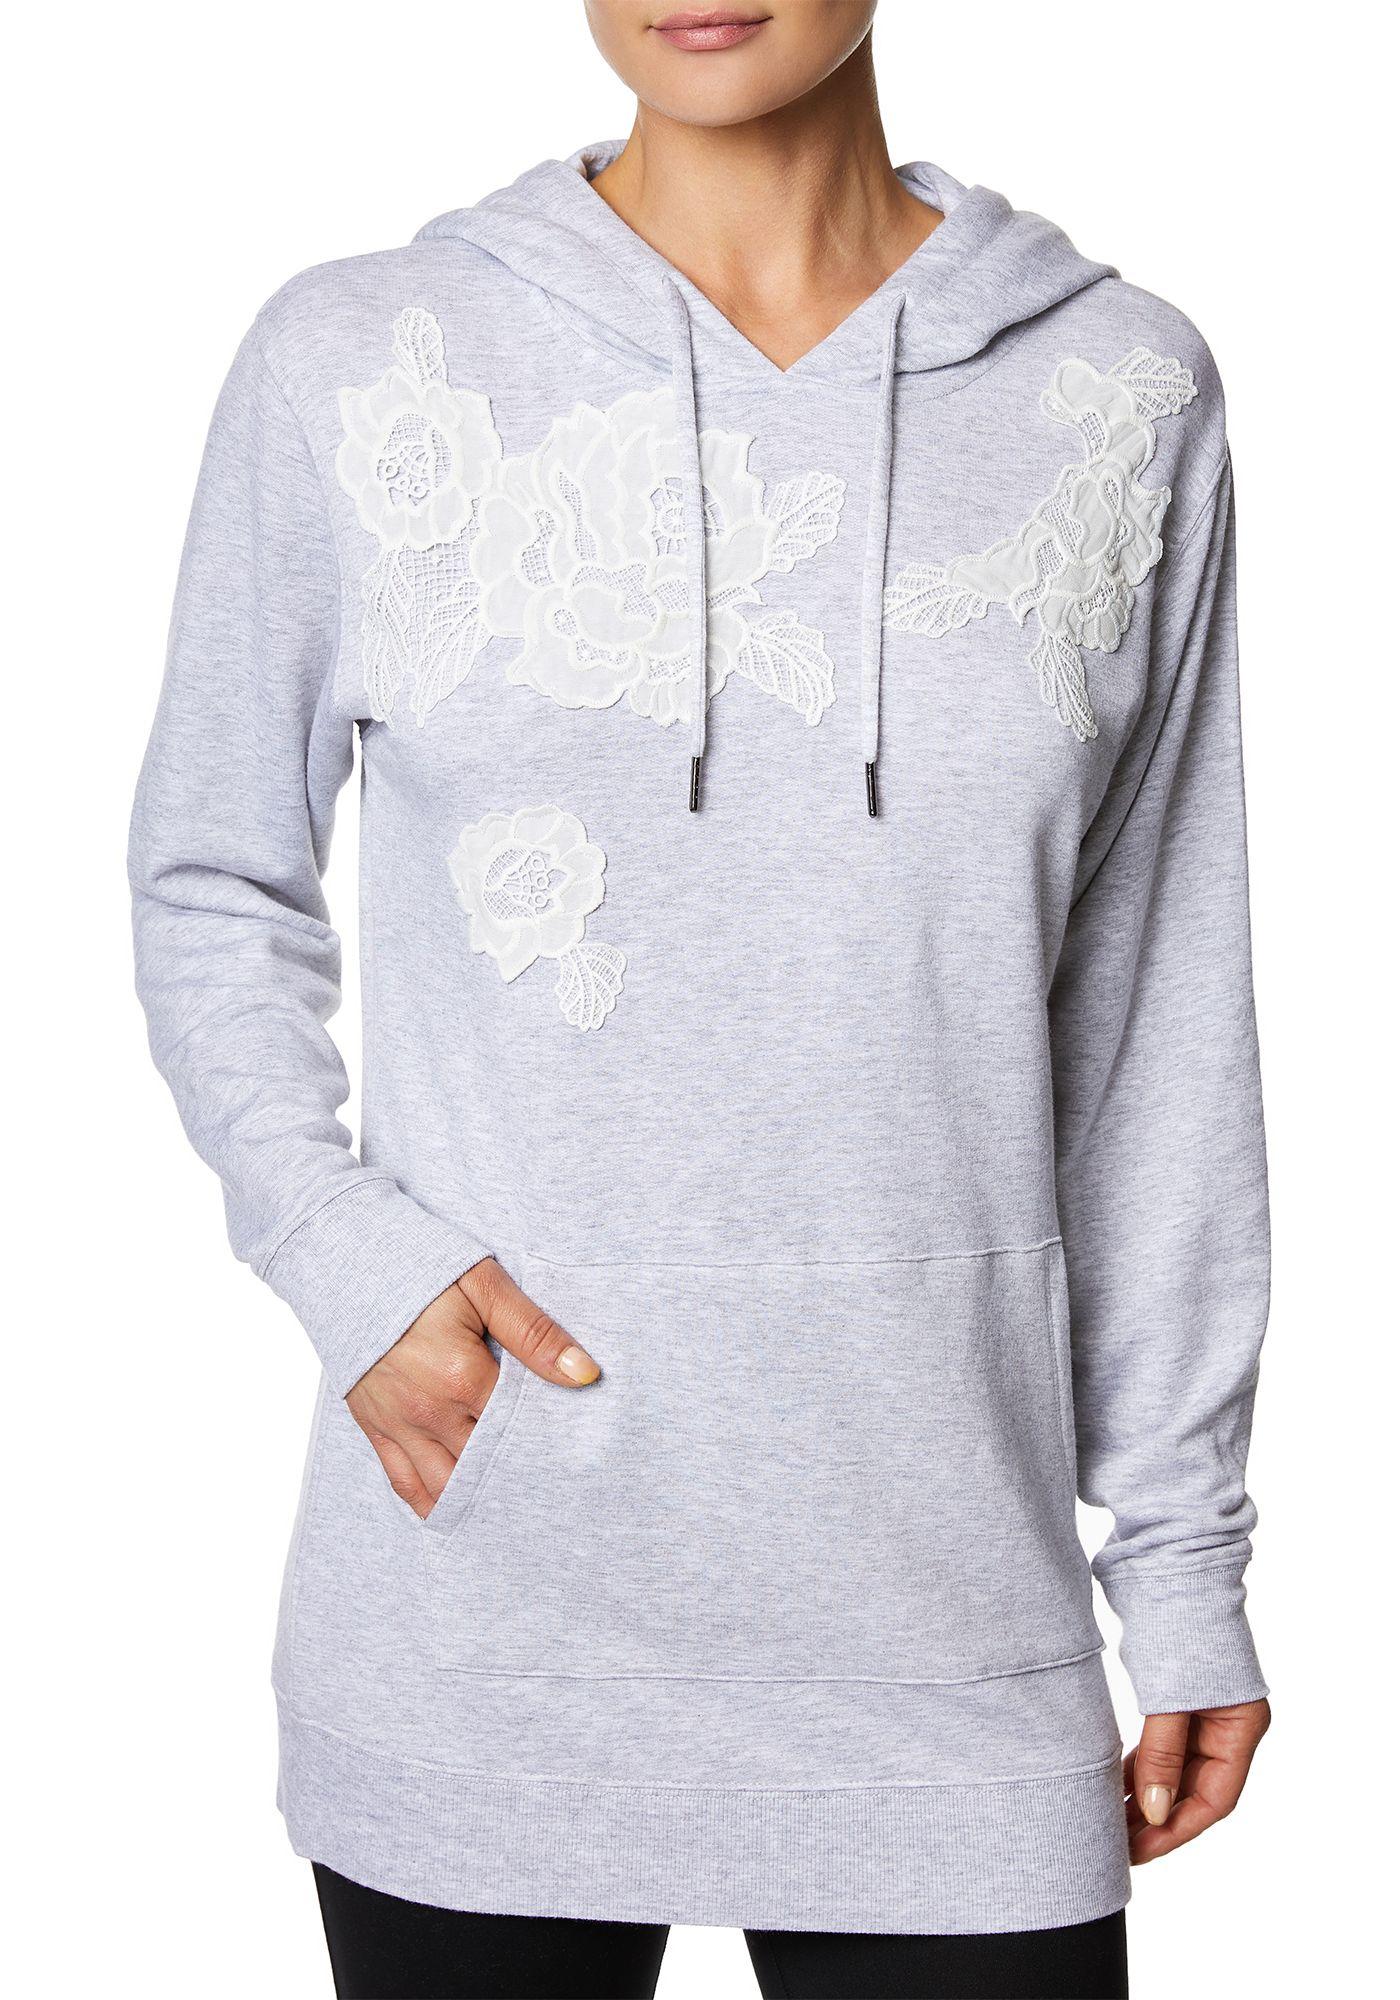 Betsey Johnson Women's Lace Applique Hoodie Dress